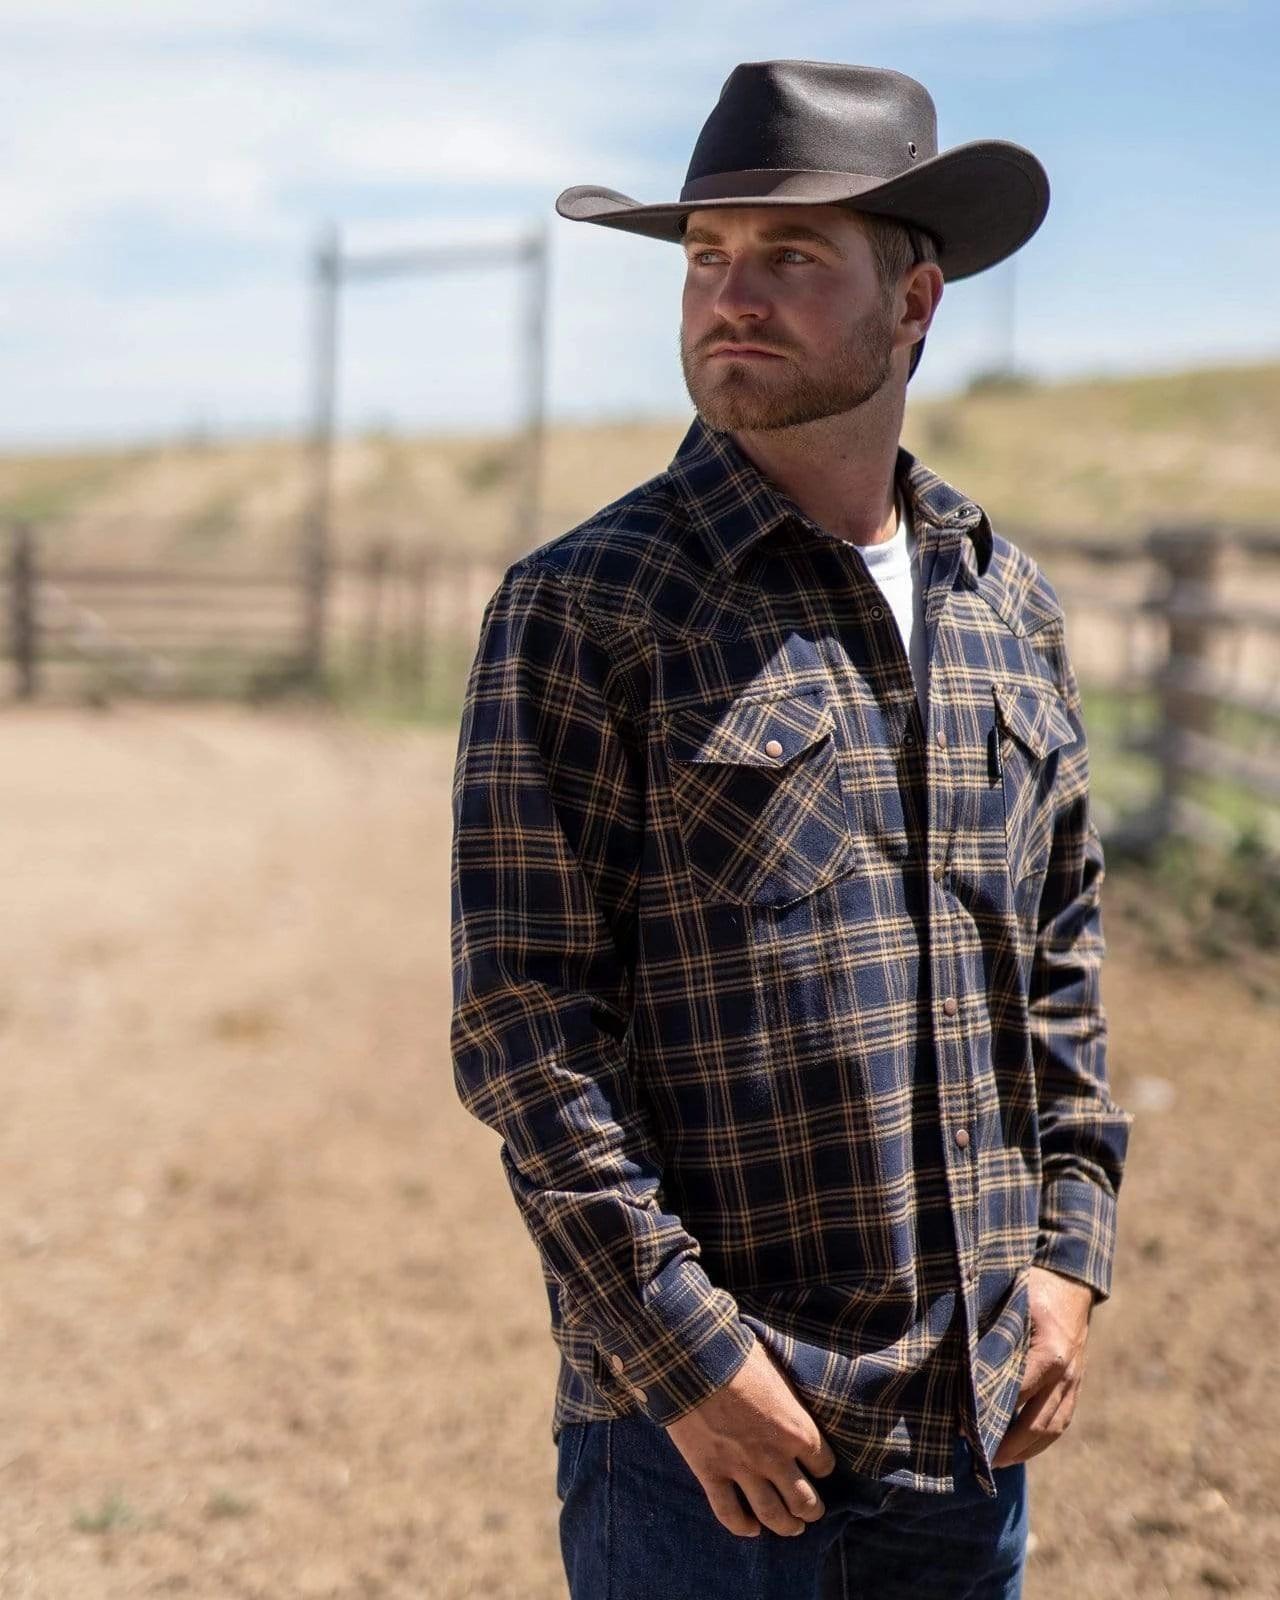 Outback Men's Outback Bowman Workman Shirt